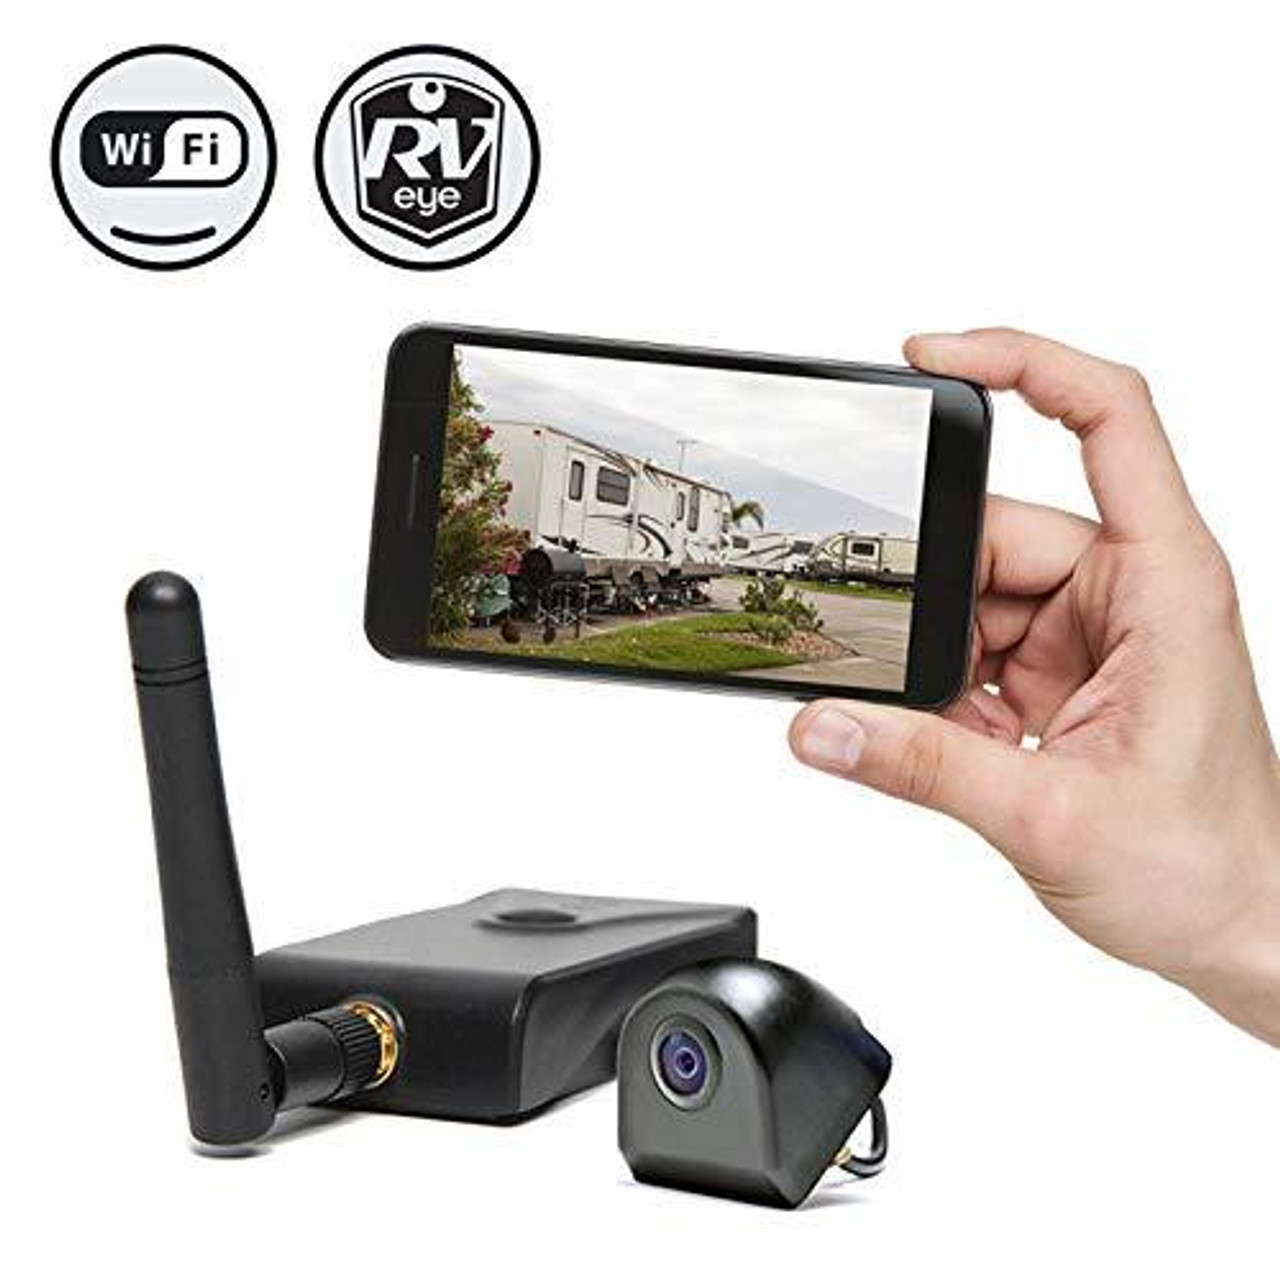 RV-Eye WiFi RV Camera